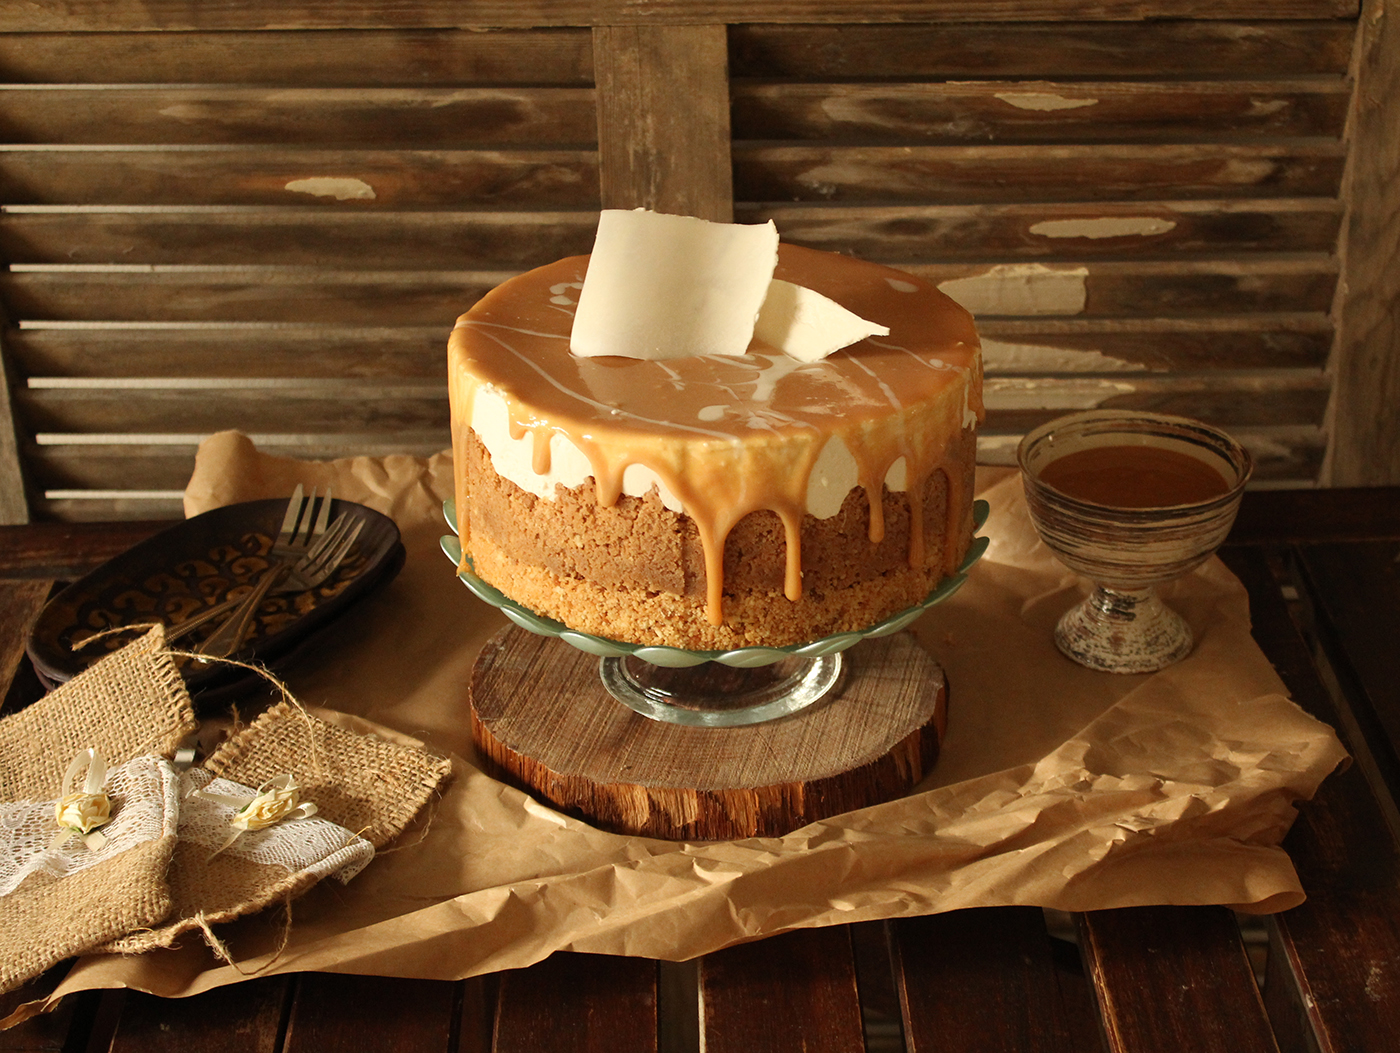 IMG 8304 - עוגת גבינה בציפוי ריבת חלב